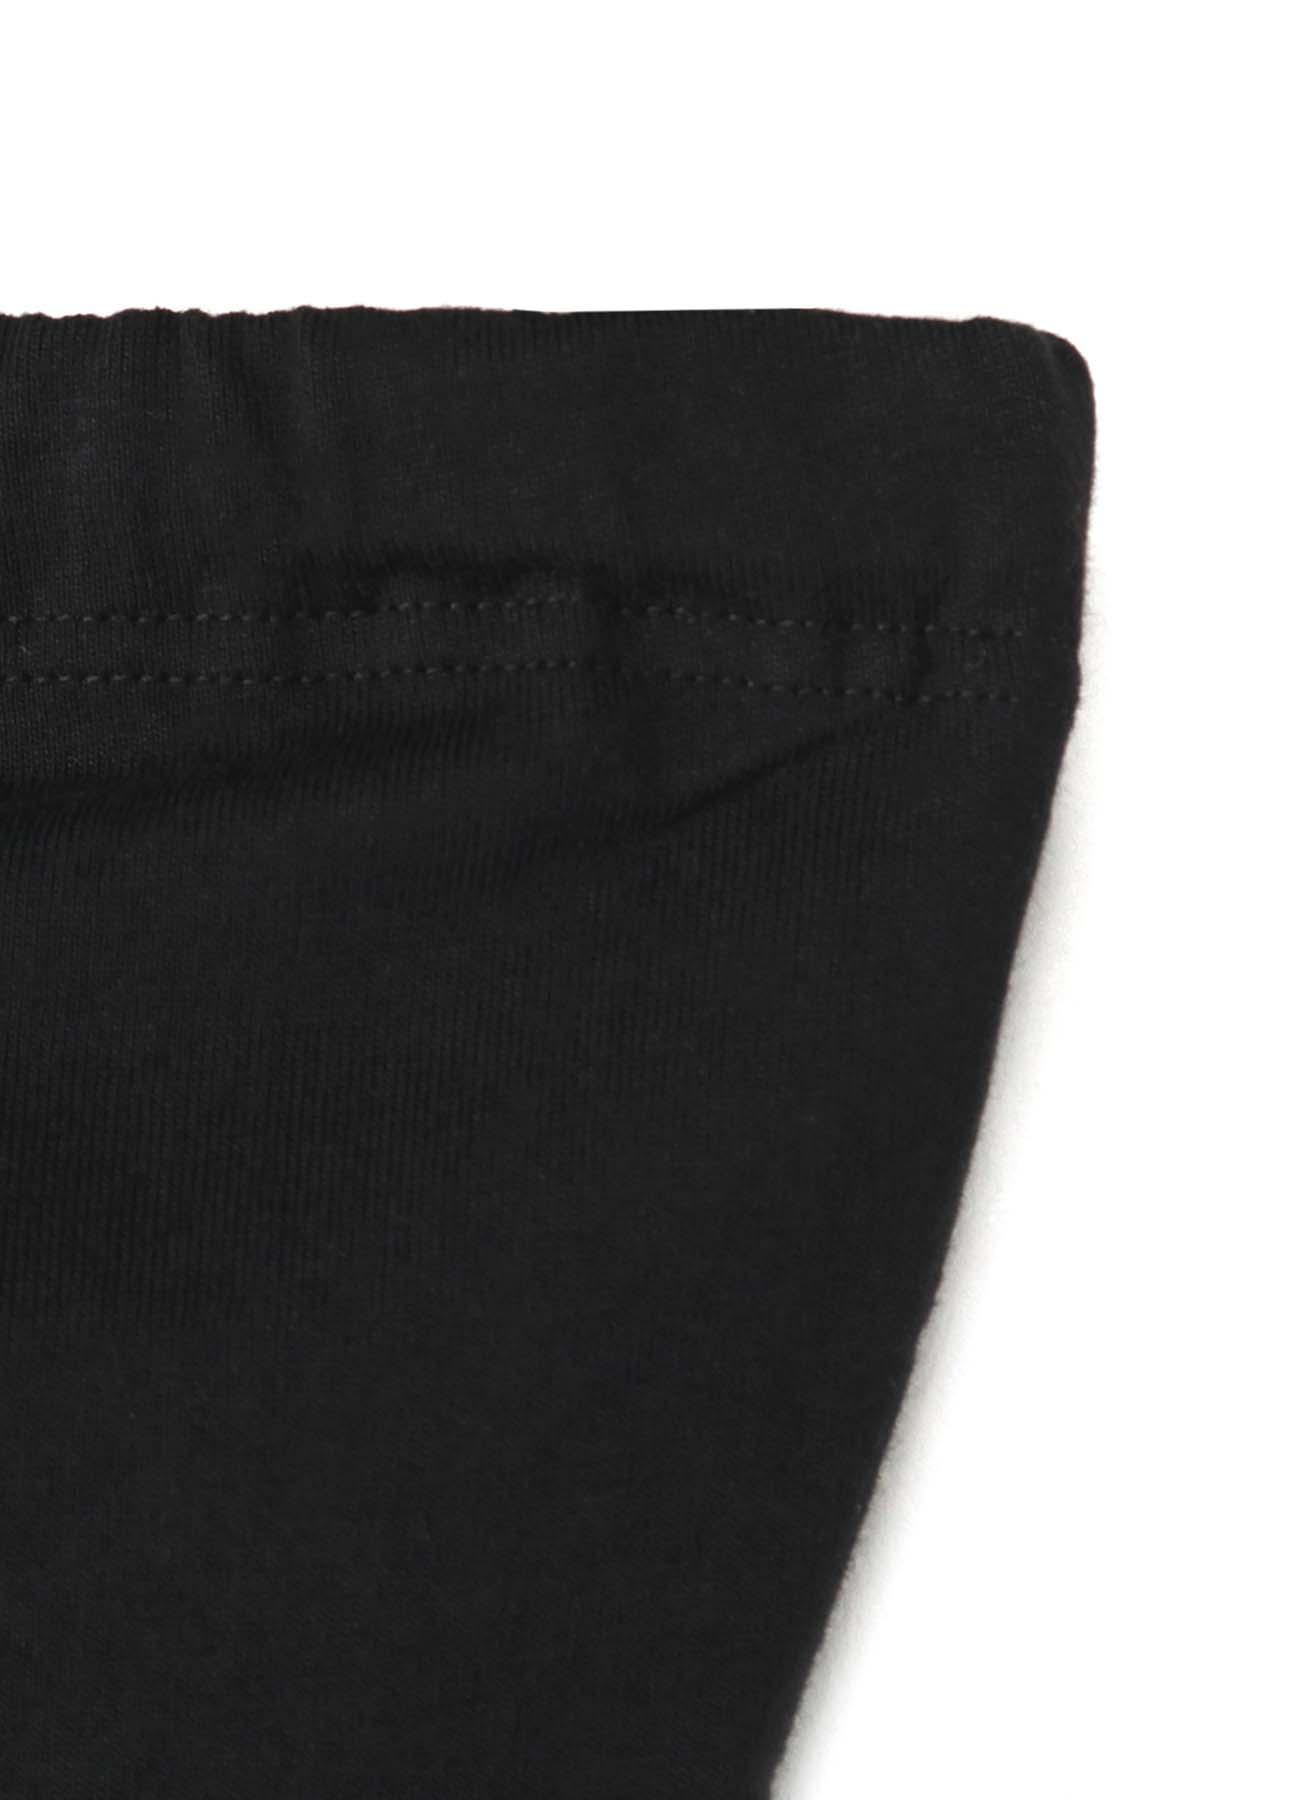 20/-C Plain Stitch Bandeau Bra